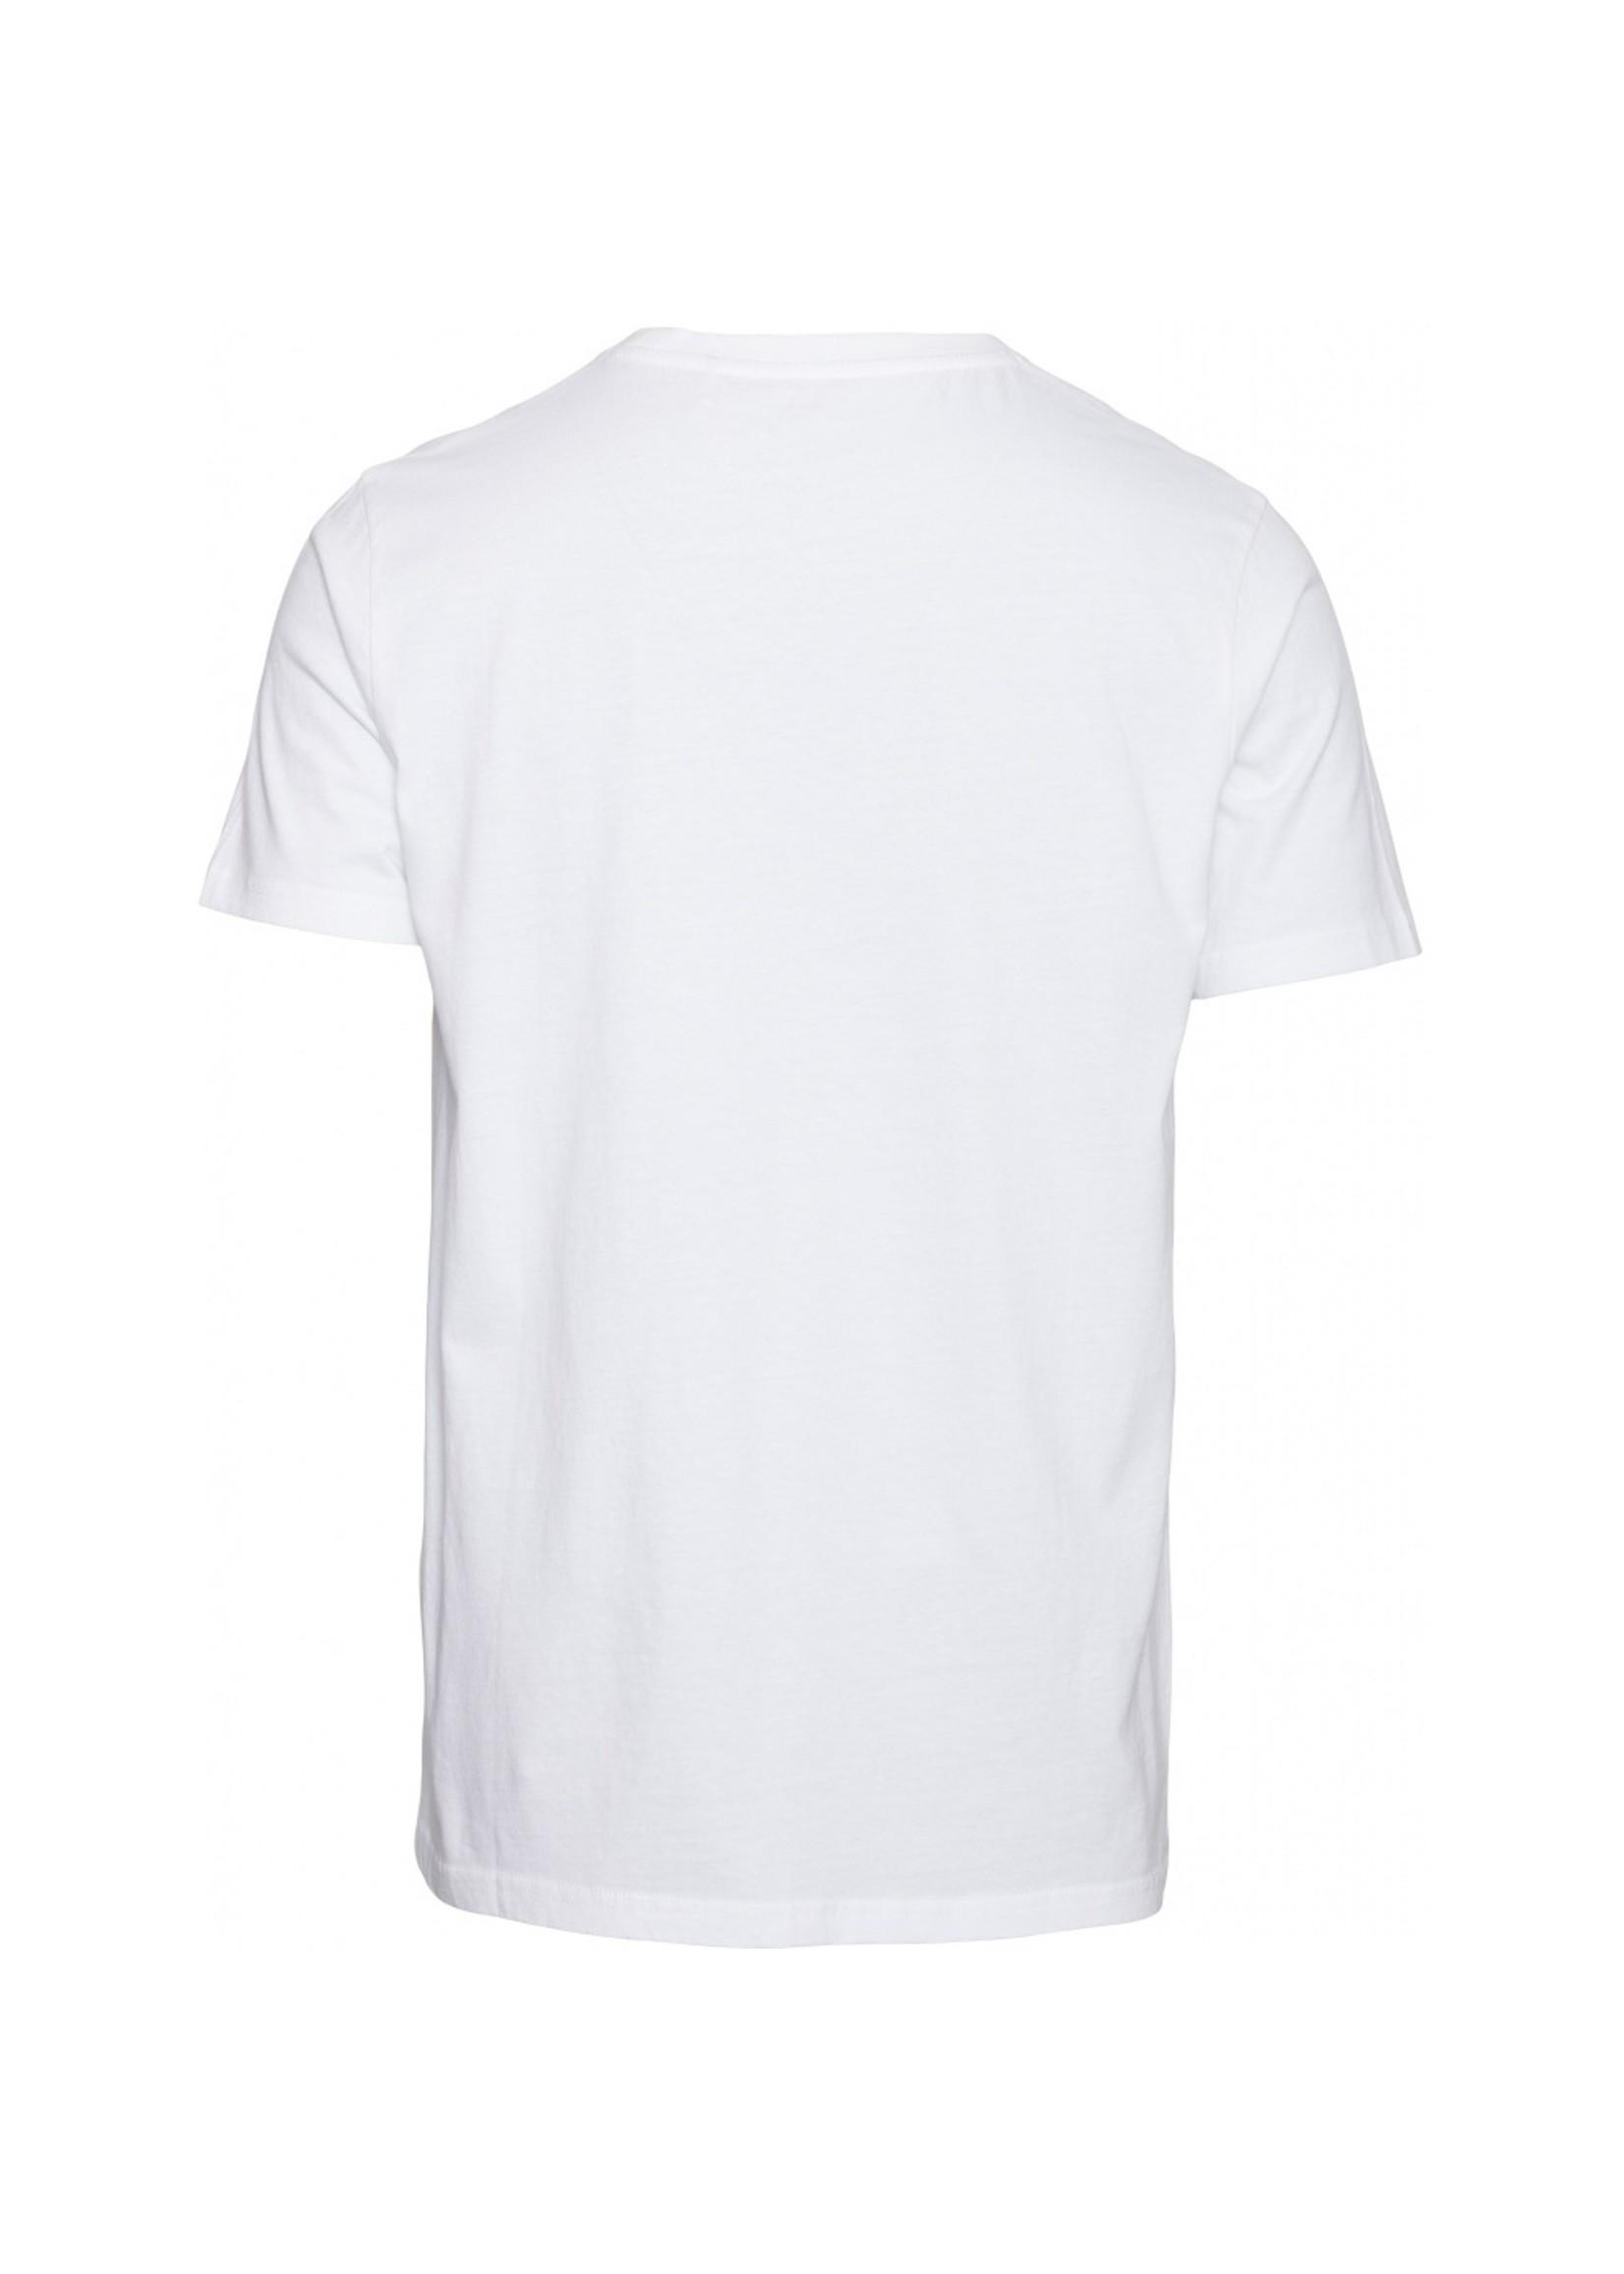 KnowledgeCotton KnowledgeCotton Alder heritage t-shirt